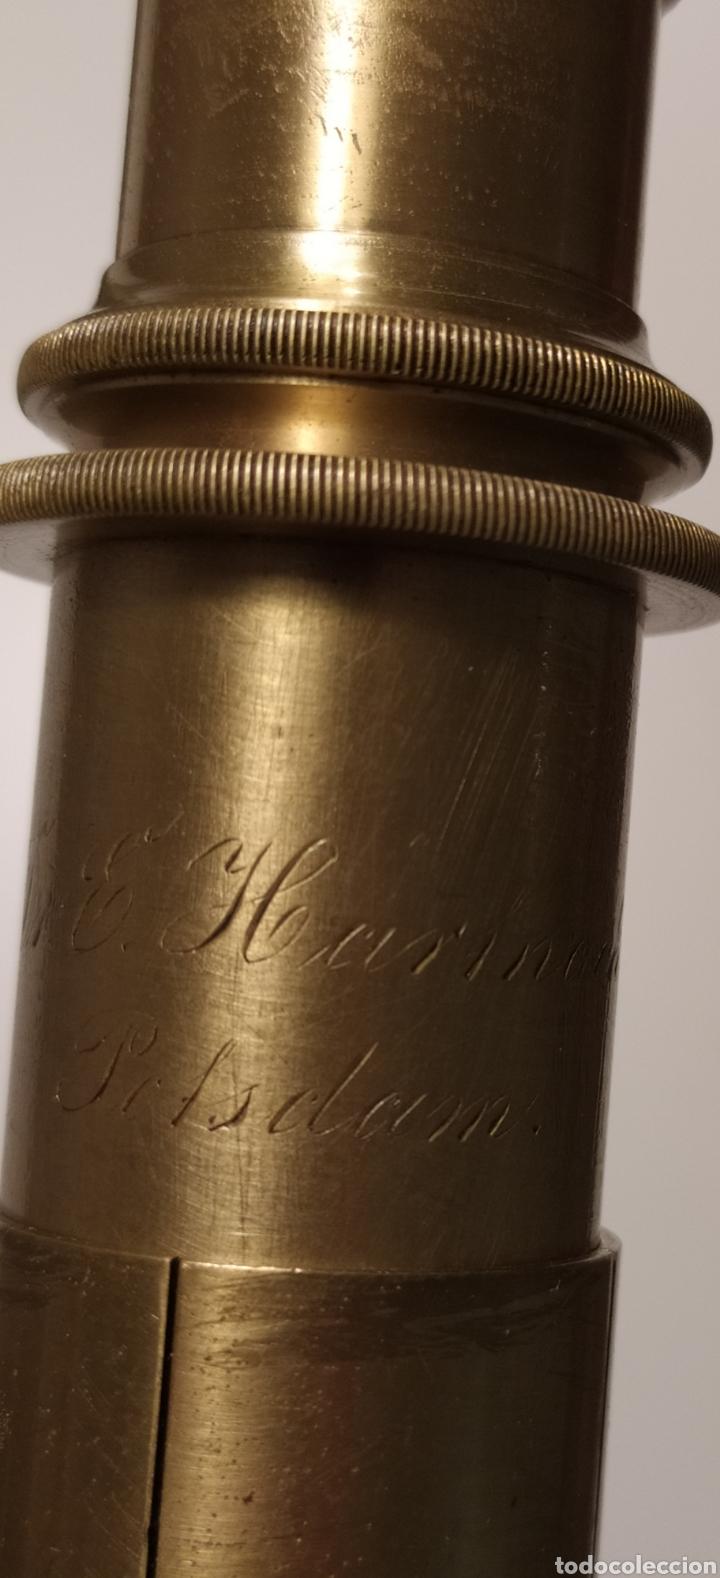 Antigüedades: Antiguo microscopio Hartnack. Postdam. C. 1875 - Foto 11 - 254743365